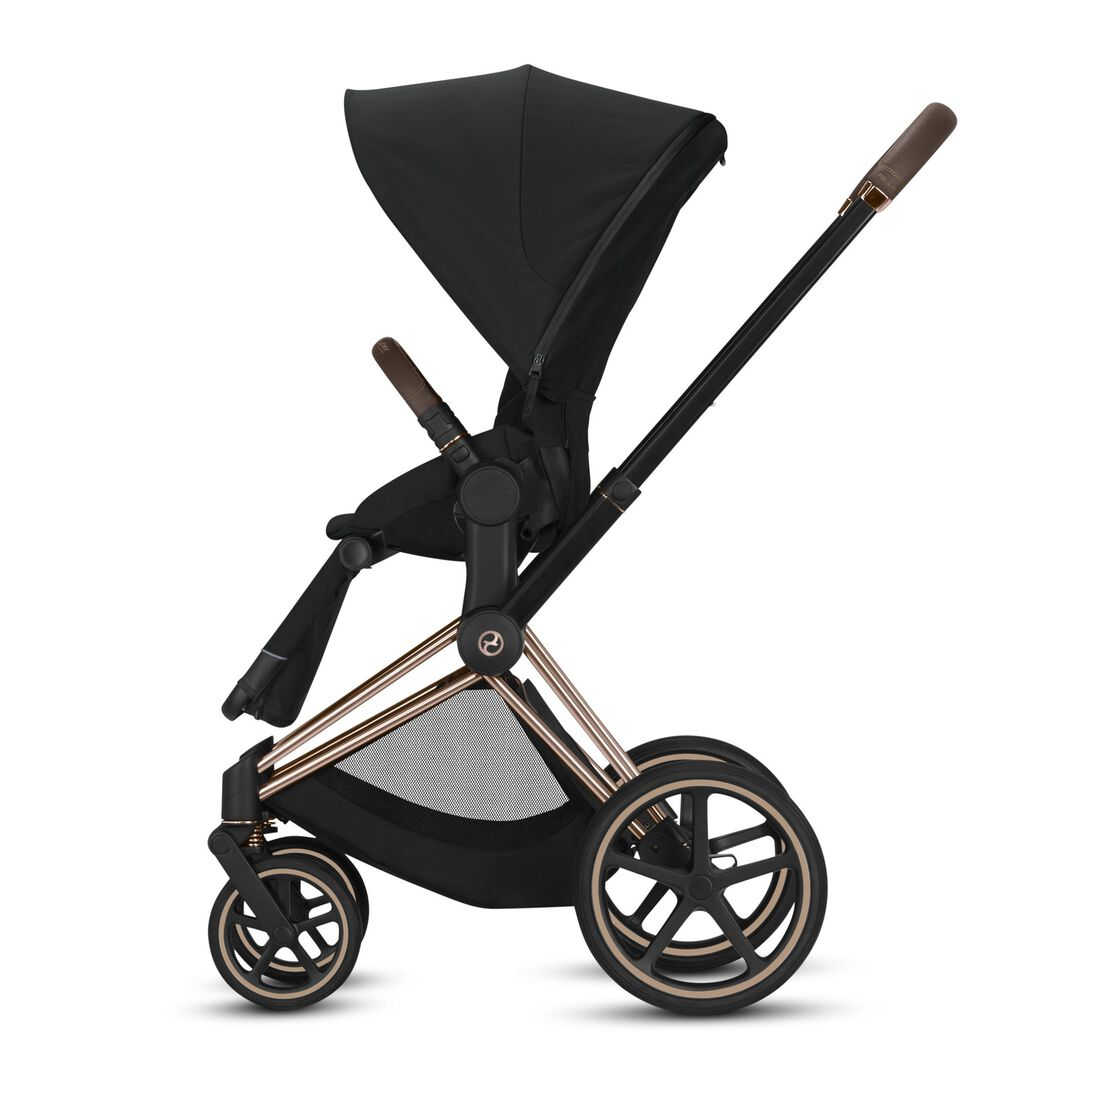 CYBEX TALOS S Lux - Black Frame - Smooth all-wheel suspension